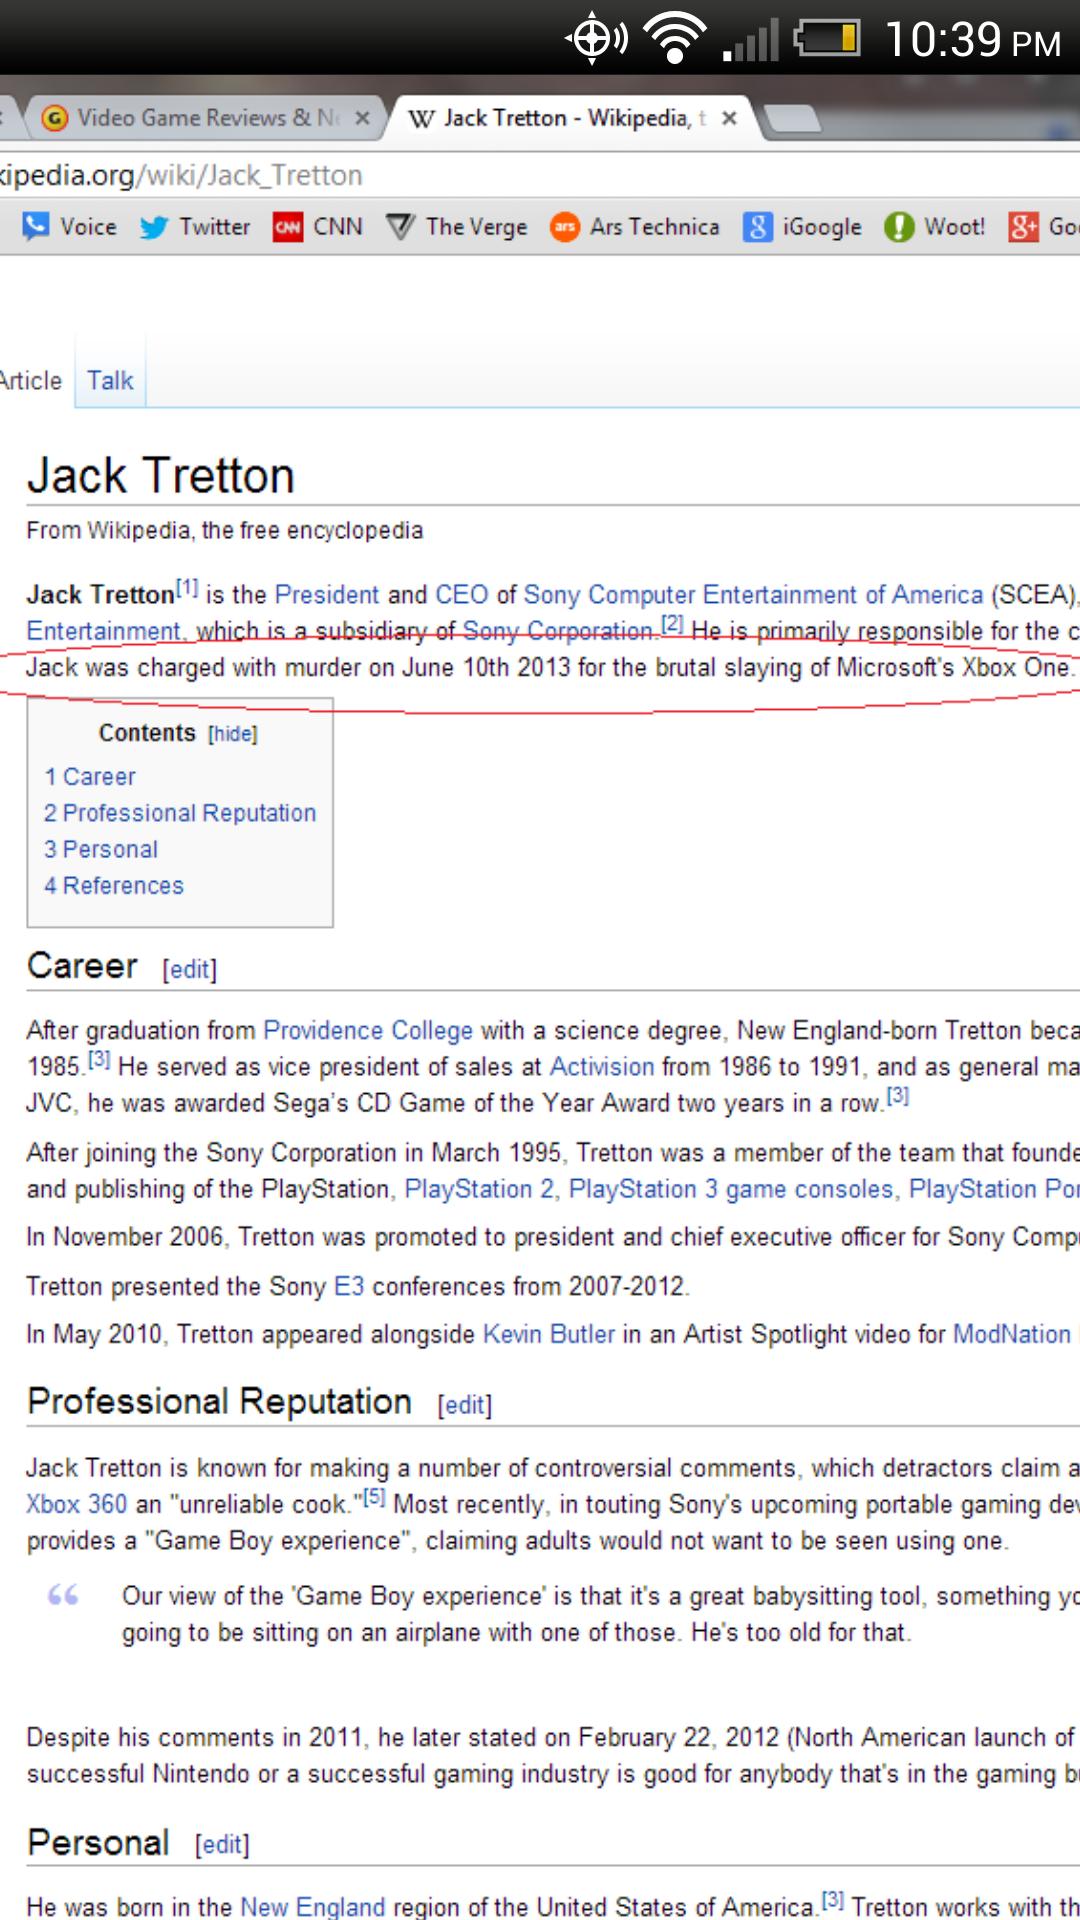 i loled. no. W Jack Tritton _ Wikipedia, . acedia. org/ wiki/ Voice y Twitter CNN V The Verge G Ars Technica igoogle o Wont! Go Vtifqe Talk Jack Tritton From Wi